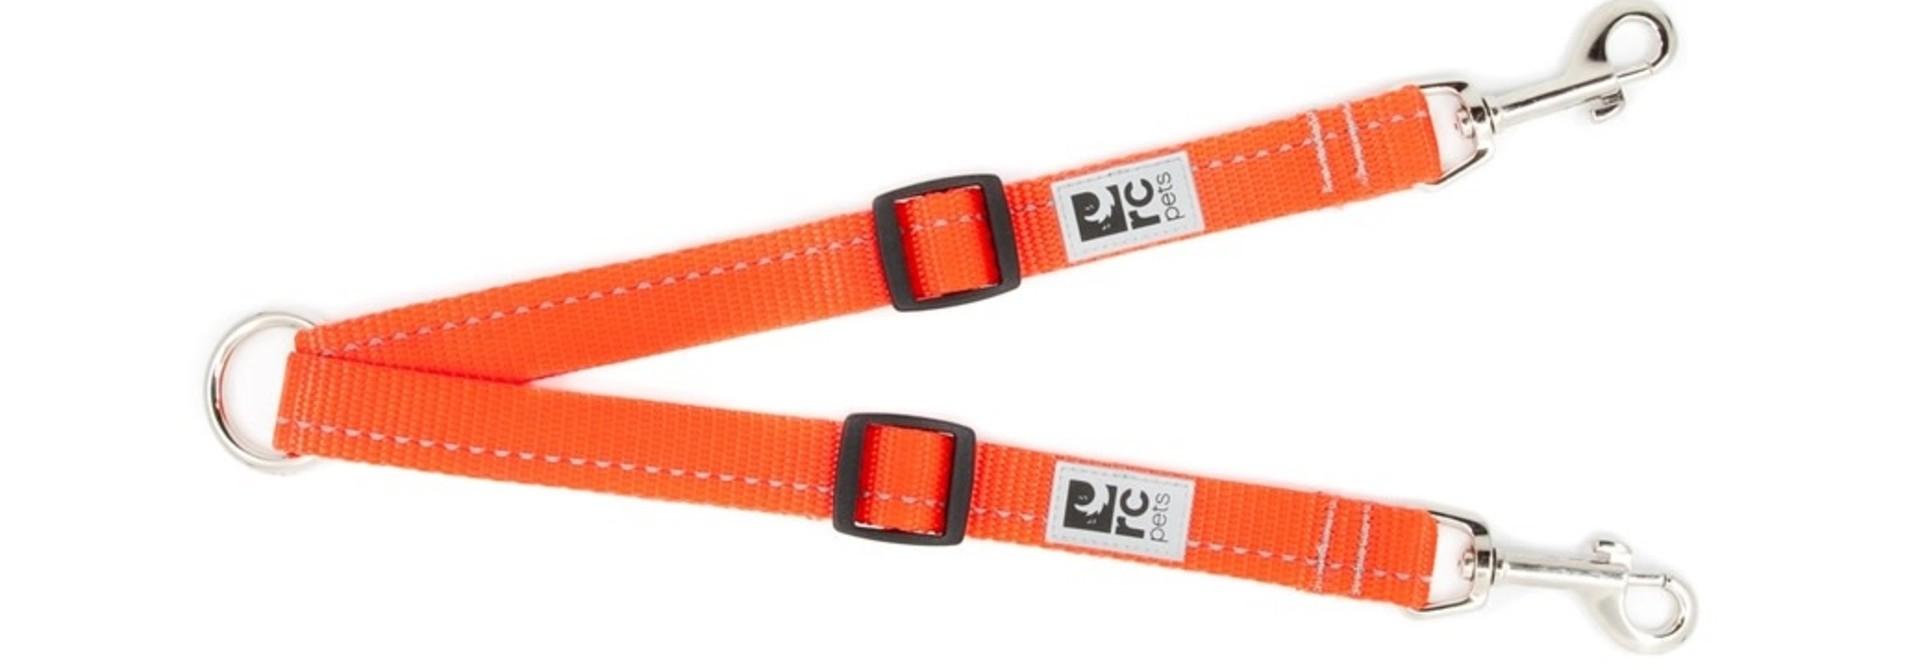 Adjustable Coupler Primary Small 3/4 Orange